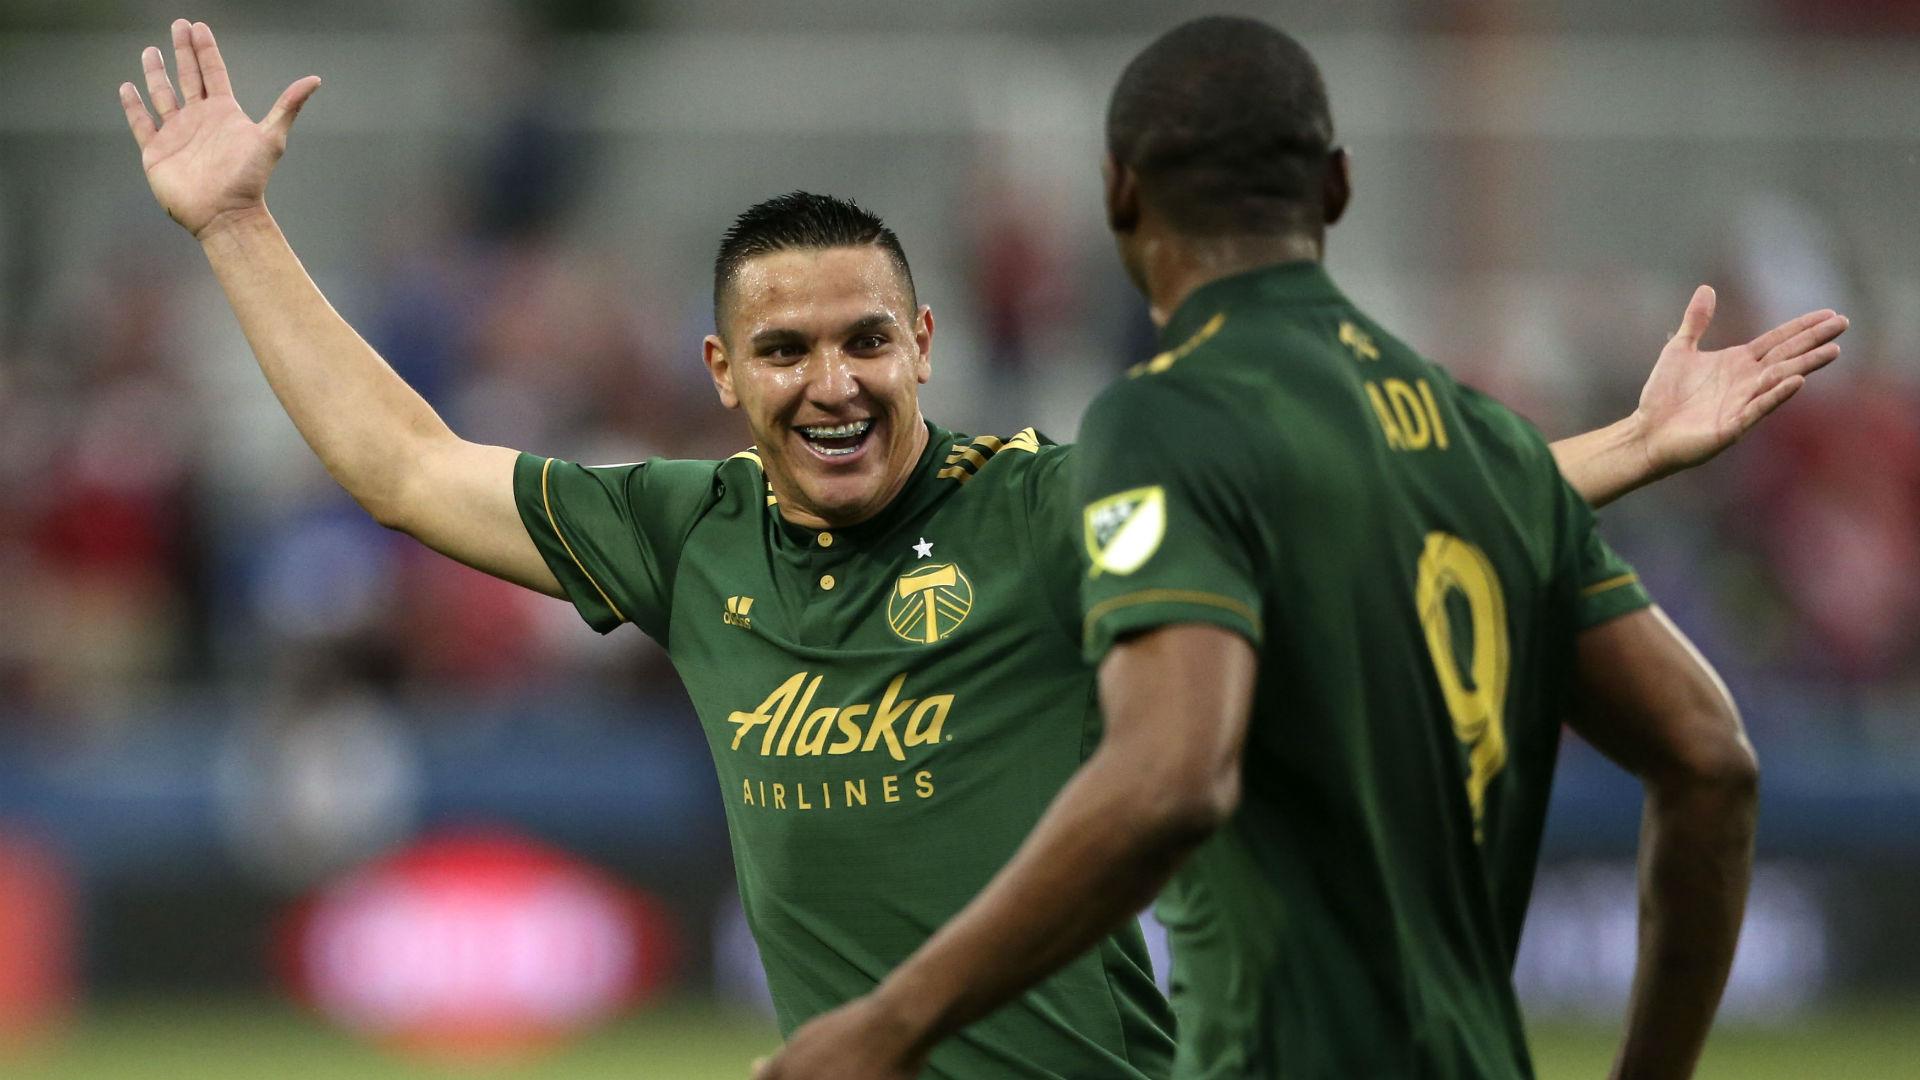 Fanendo Adi David Guzman Portland Timbers MLS